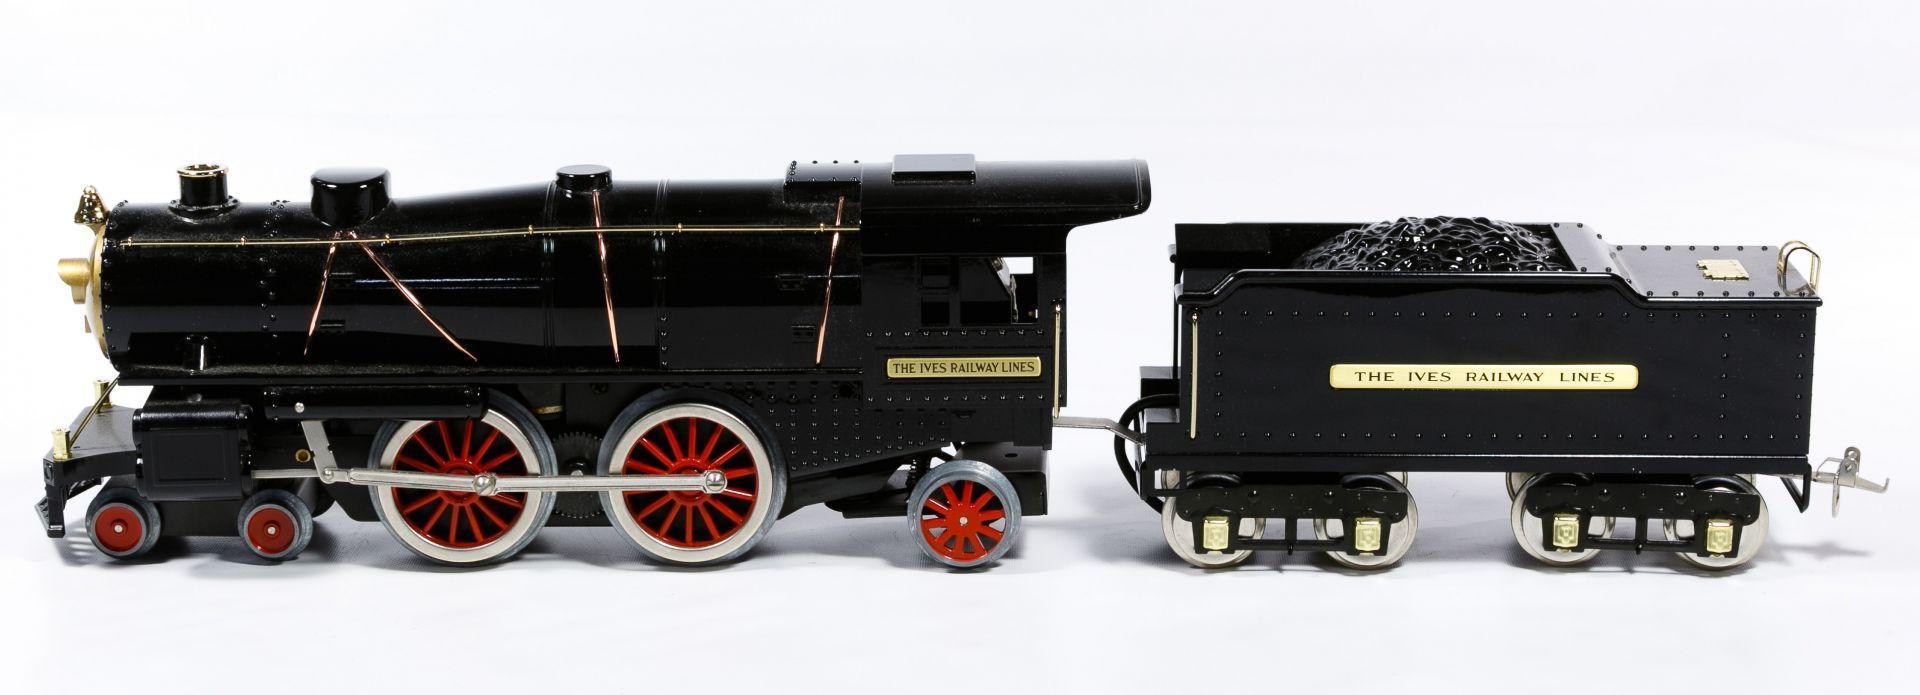 Lot 375: MTH Standard Gauge Ives Railway Model Locomotive